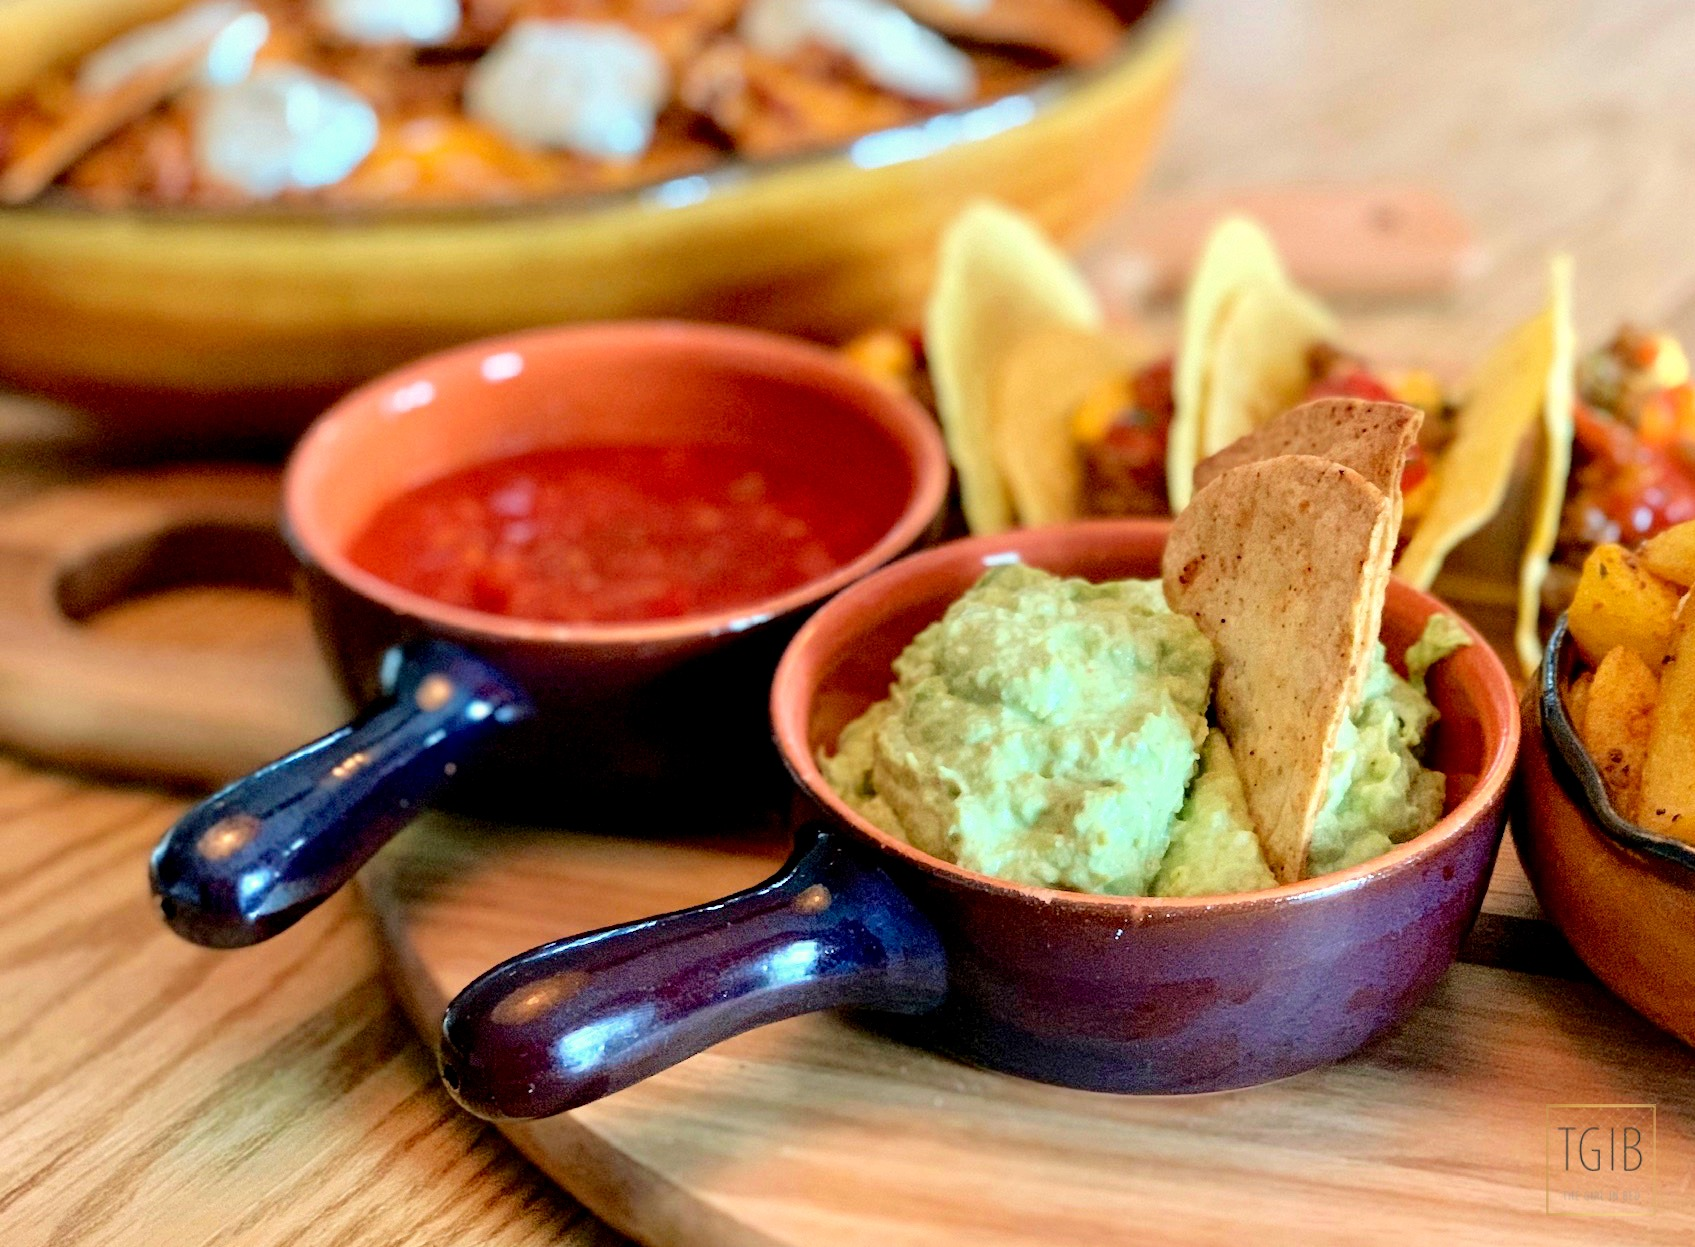 Tex Mex Guacamole Tex mex food